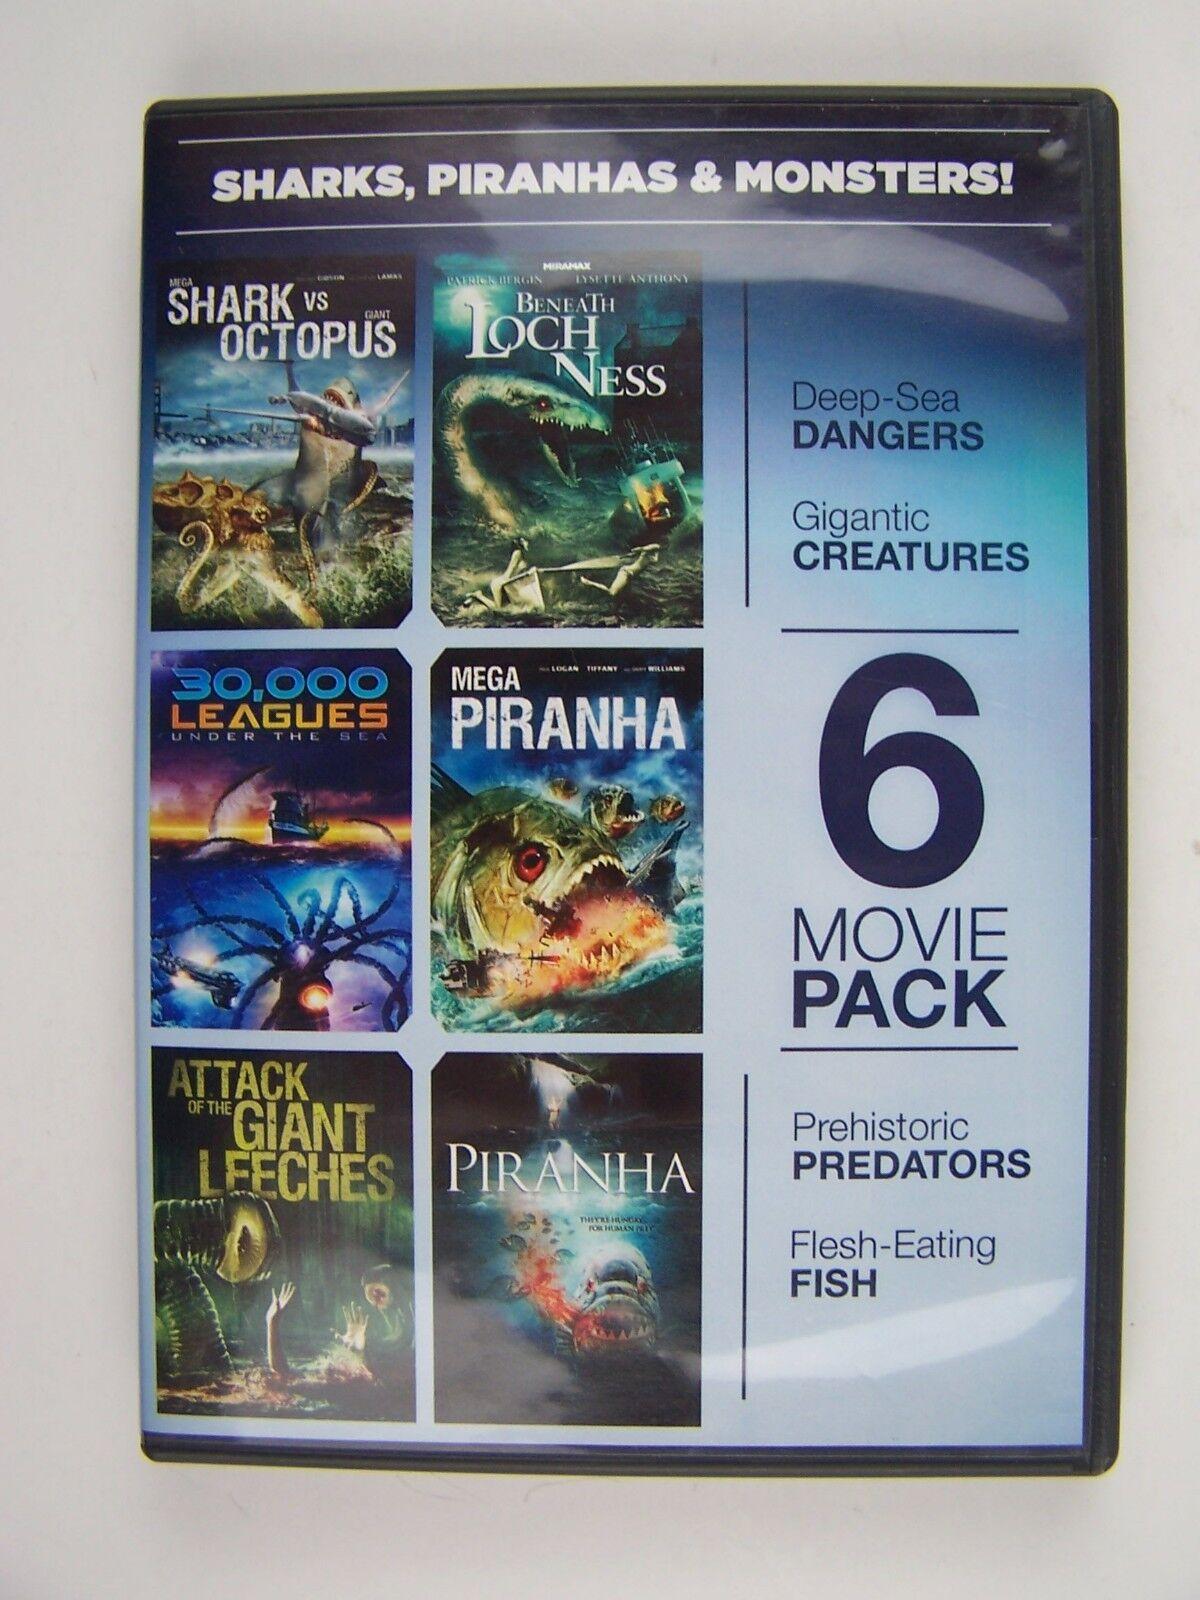 Sharks, Piranhas & Monsters DVD Movie 6-Pack Box Set 96